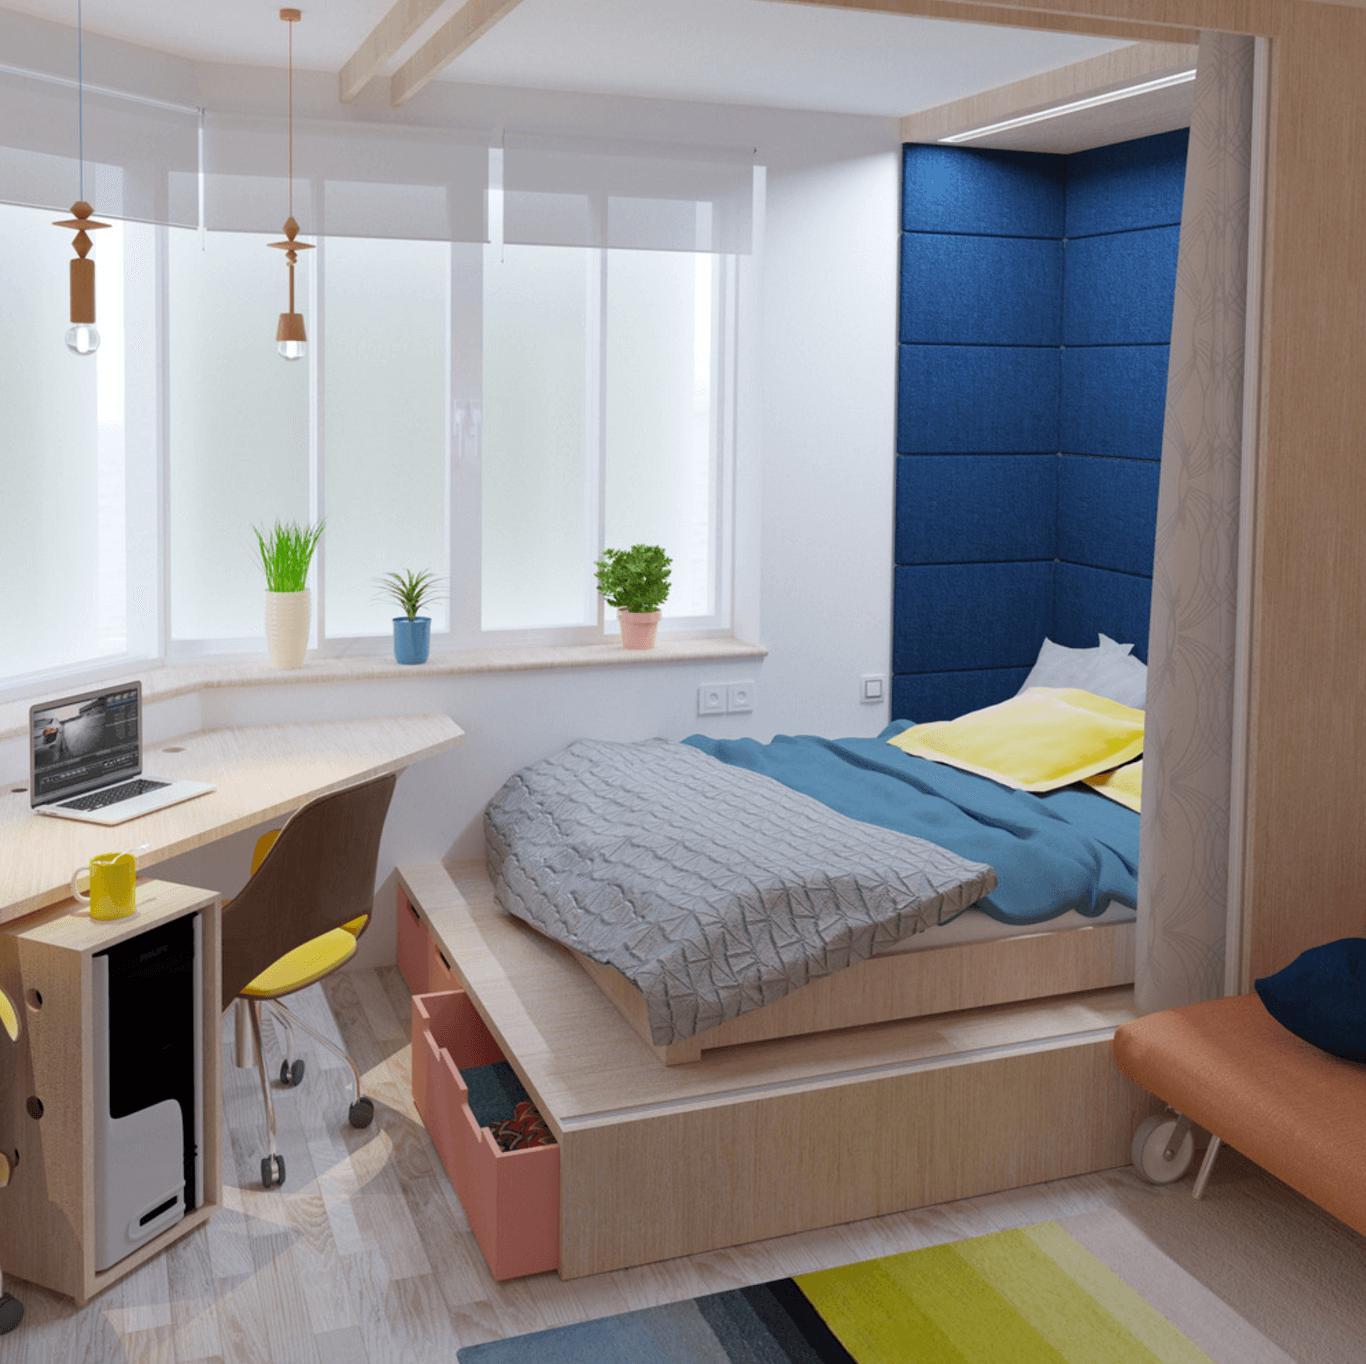 Bedroom On The Podium. One Room ApartmentApartment DesignThe  PodiumApartments